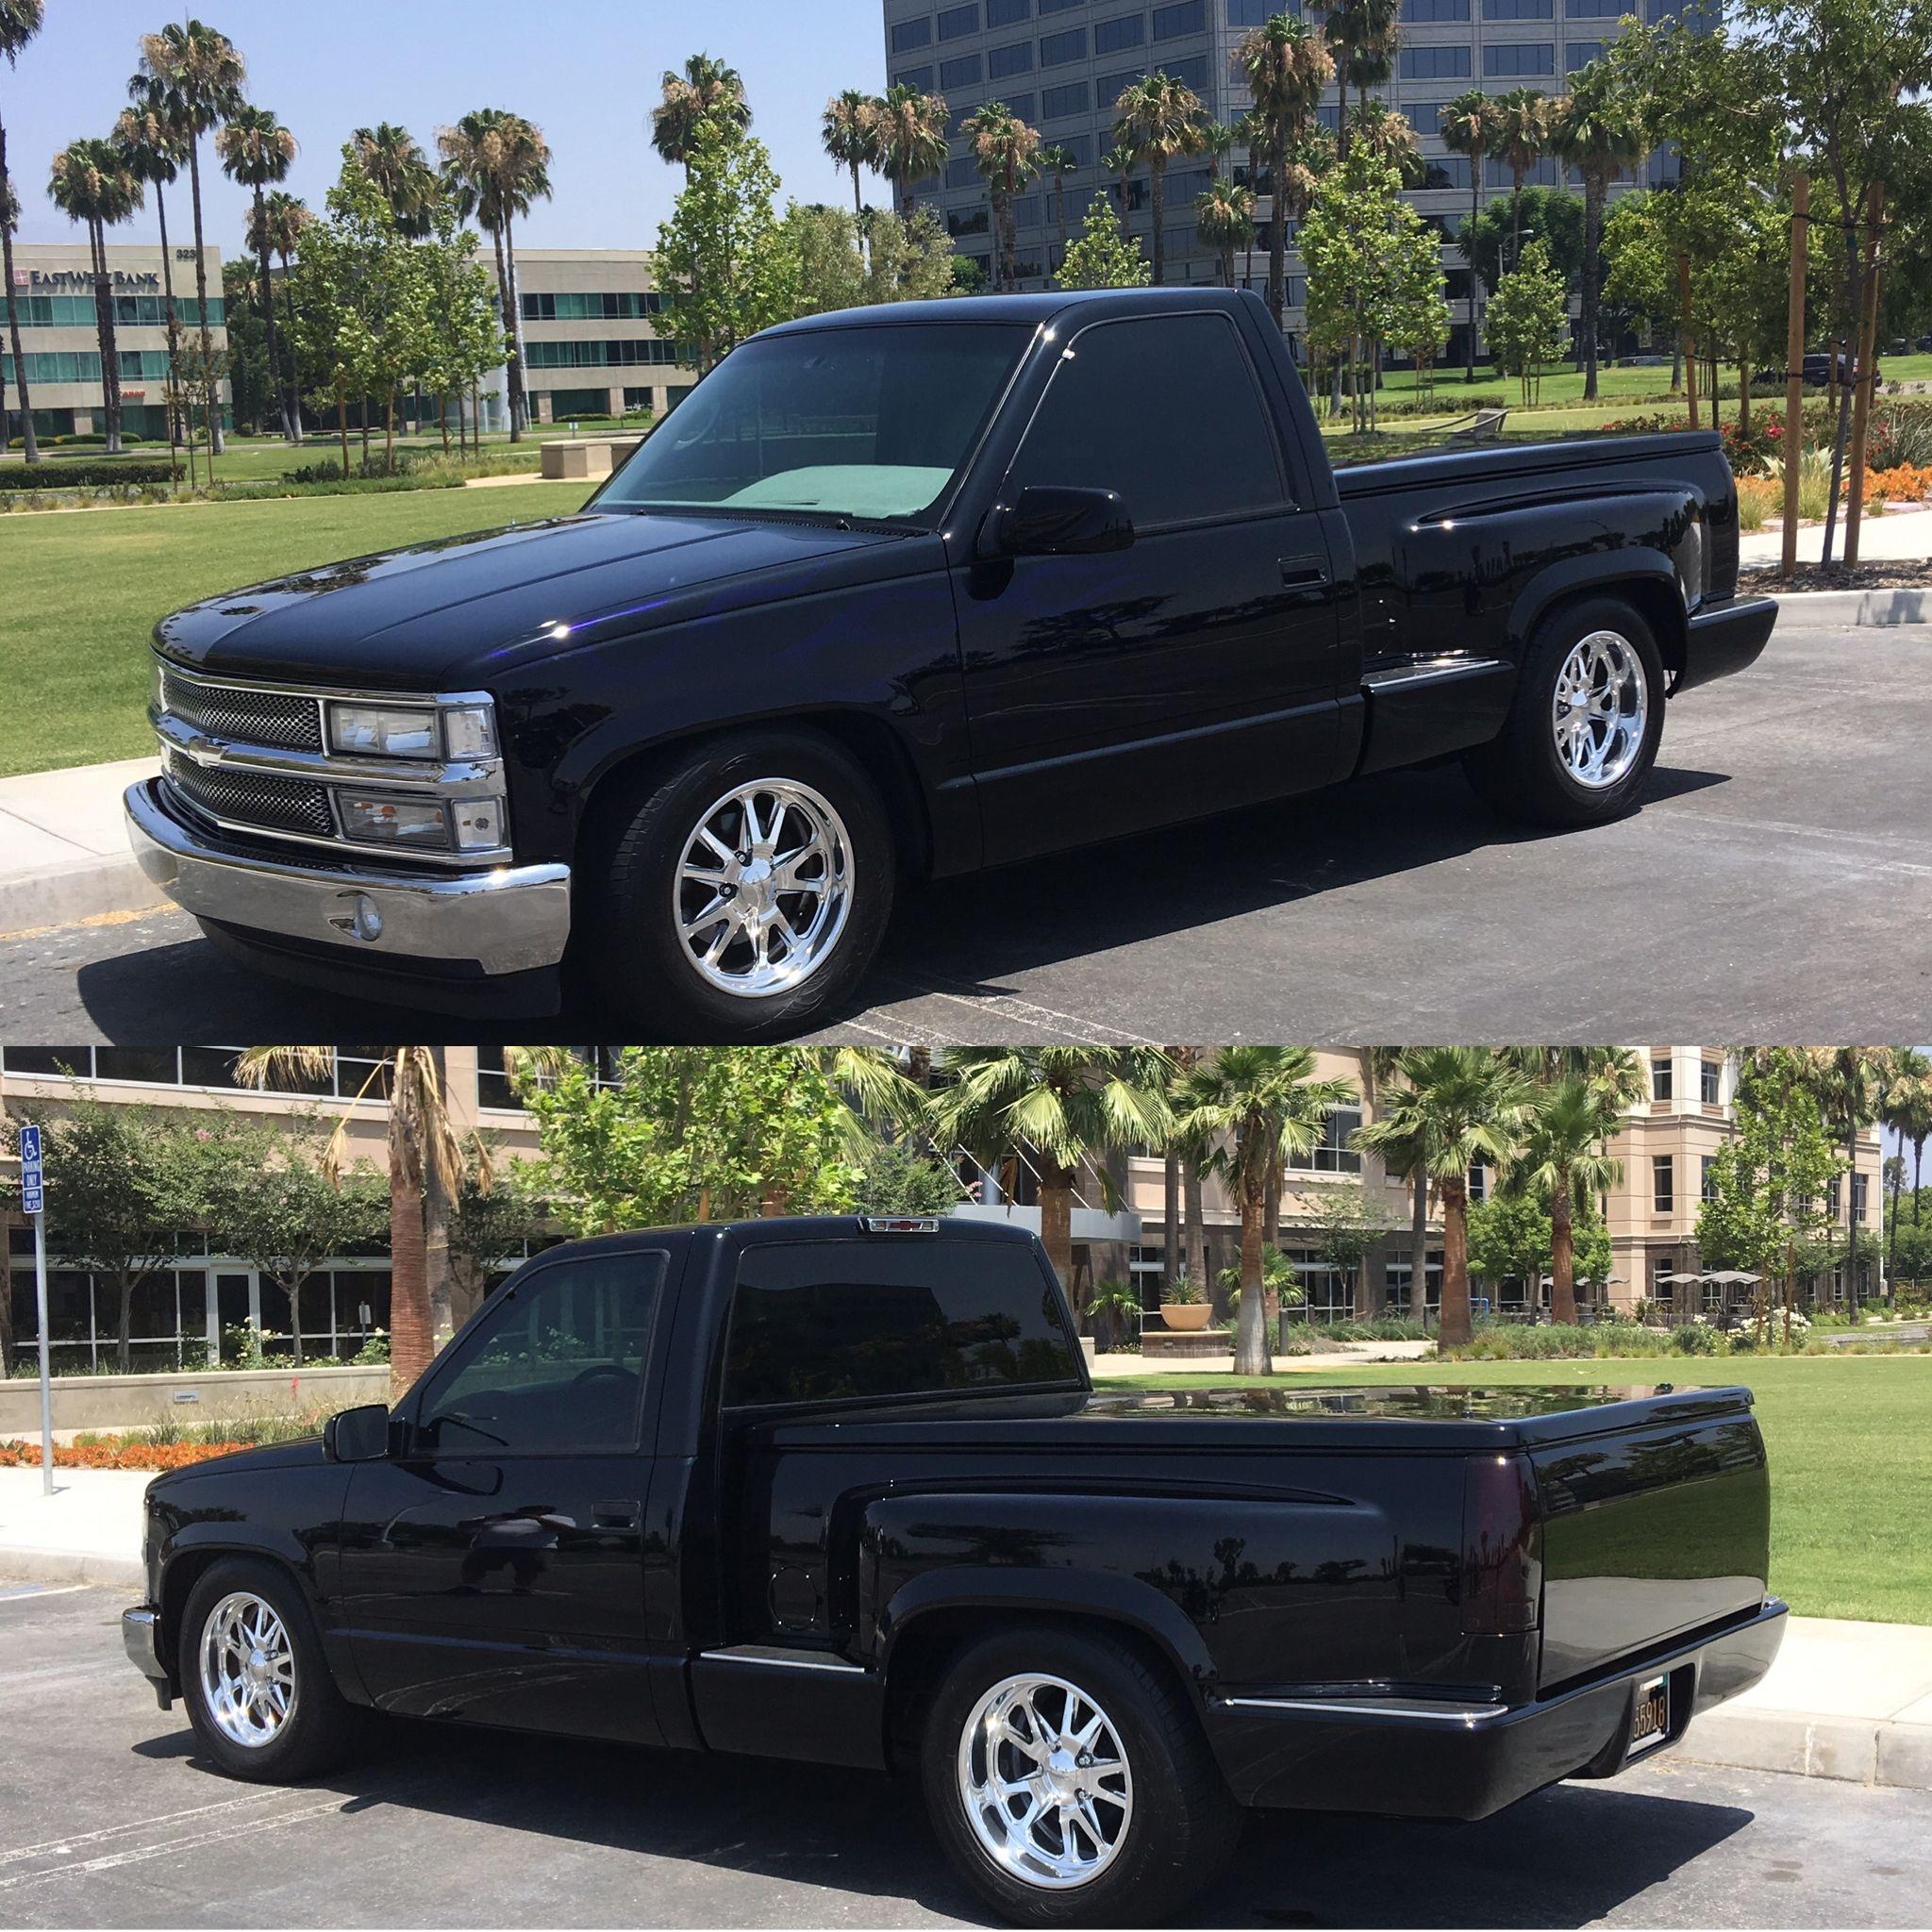 medium resolution of 96 stepside 1999 chevy silverado chevy s10 gm trucks chevy trucks car